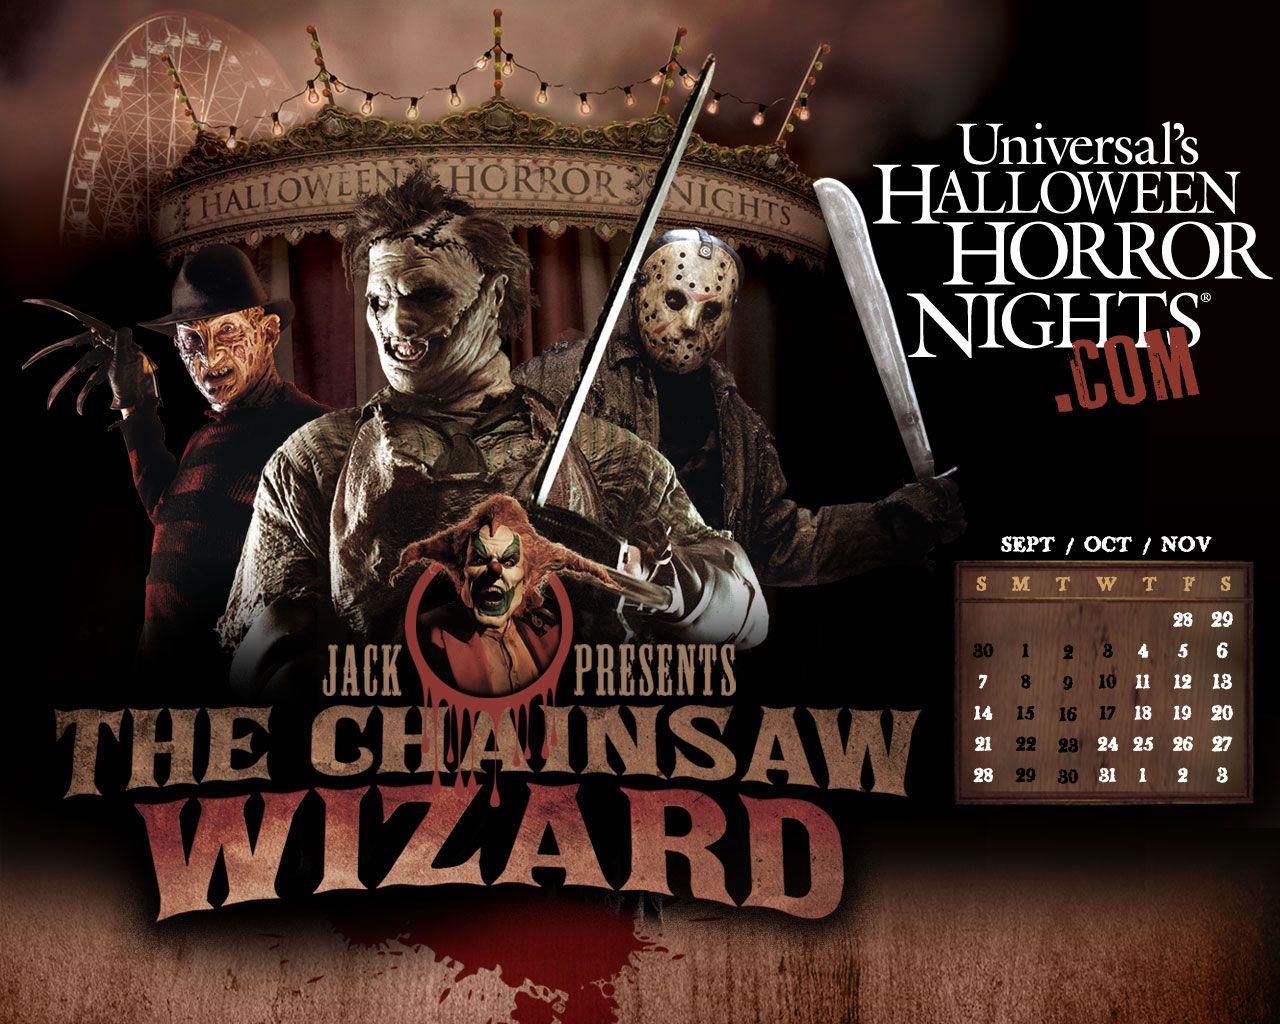 Hhn 17 Wallpaper Halloween Horror Nights Universal Studios Theme Park Halloween Horror